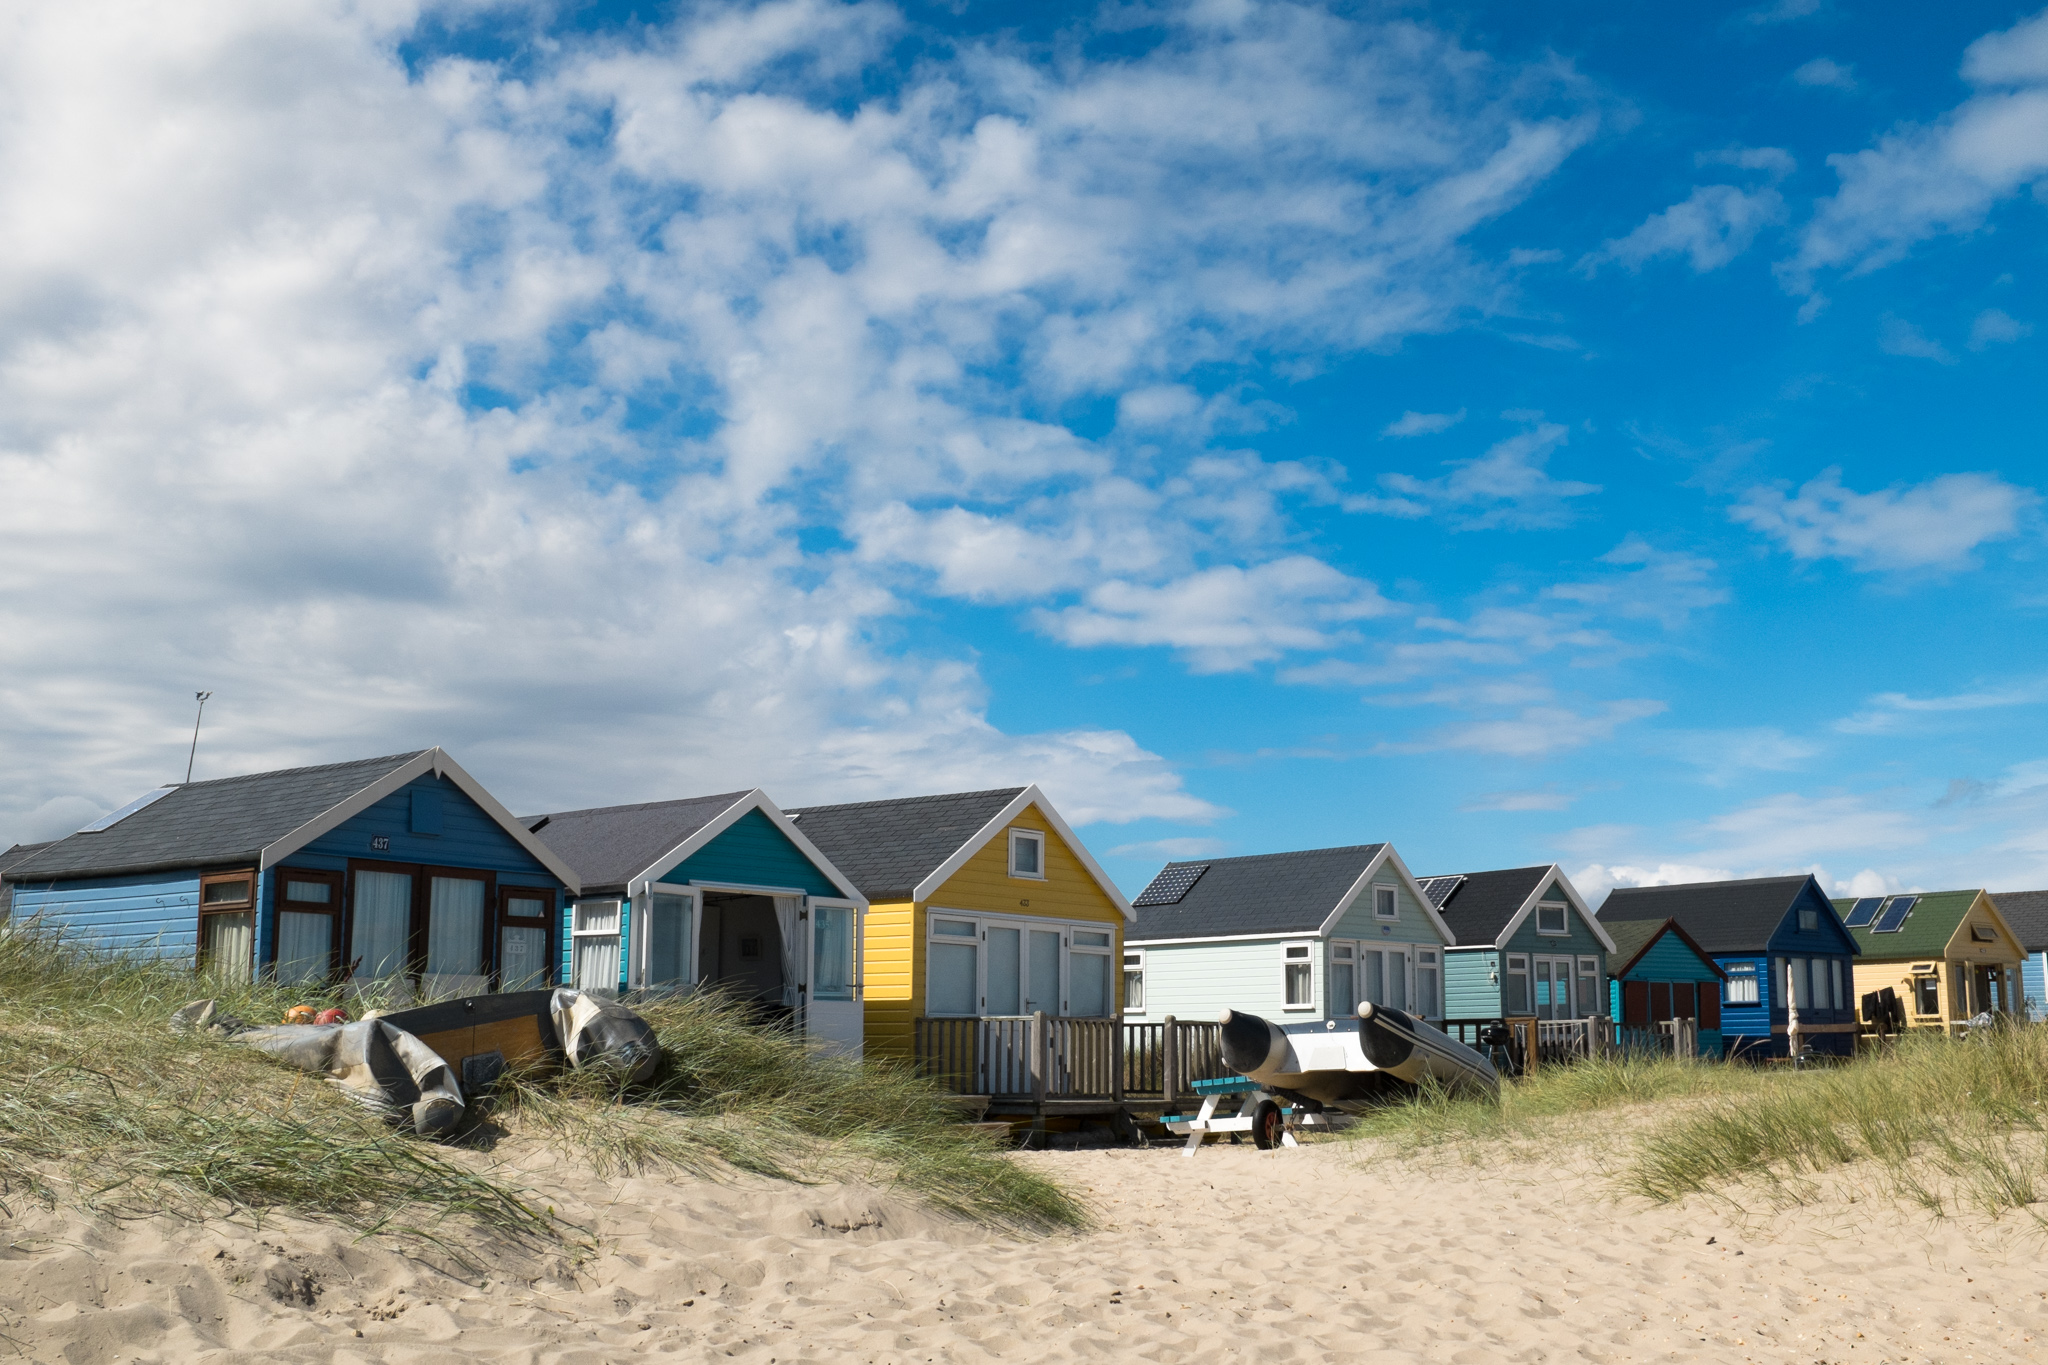 4884-urban-bournemouth-colourful-houses.jpg